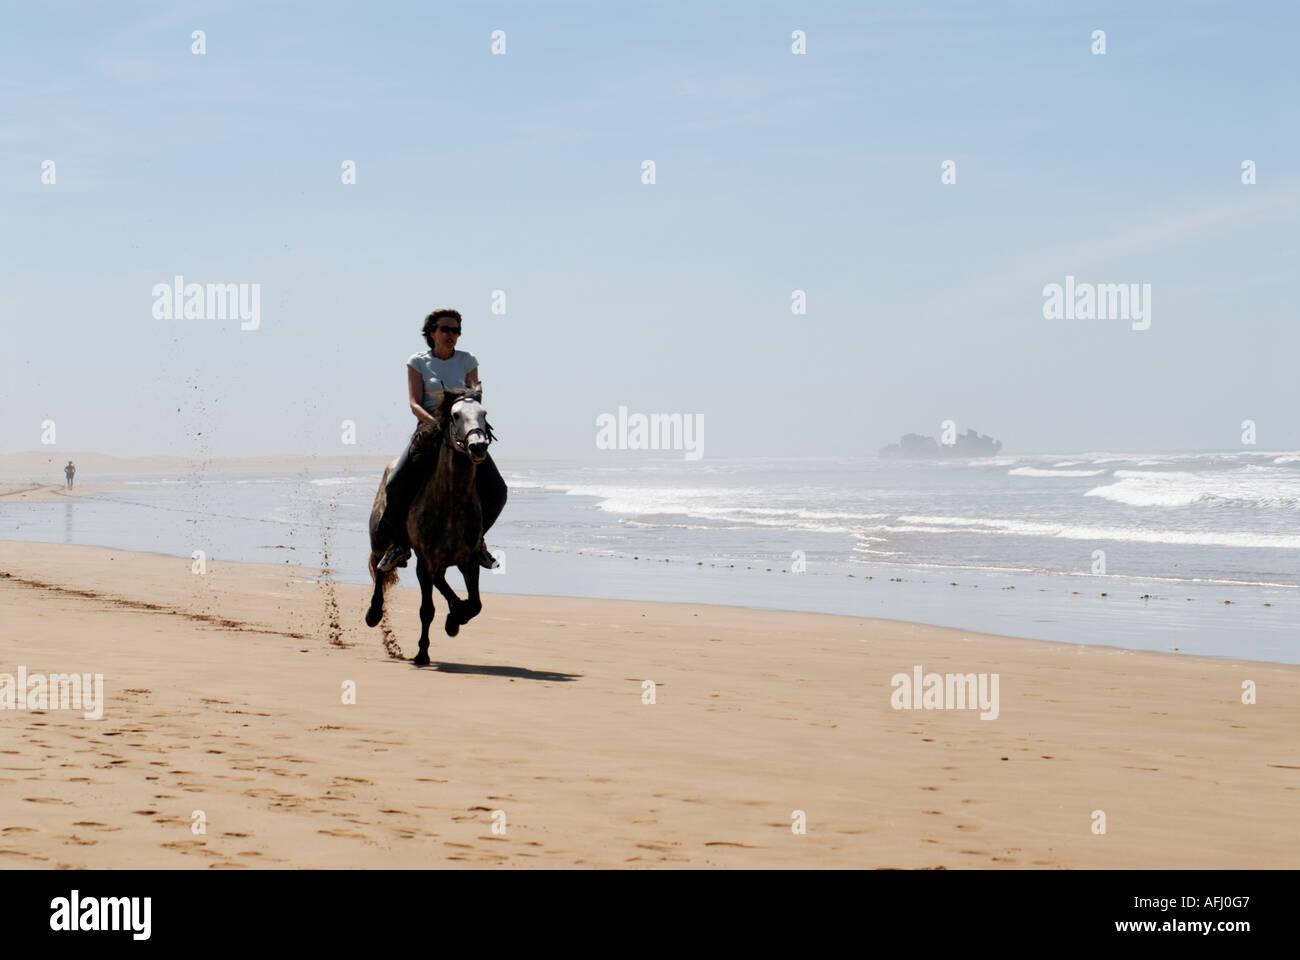 Female tourist riding horse on the beach Essaouira north Atlantic Morocco North Africa Kim Paumier - Stock Image